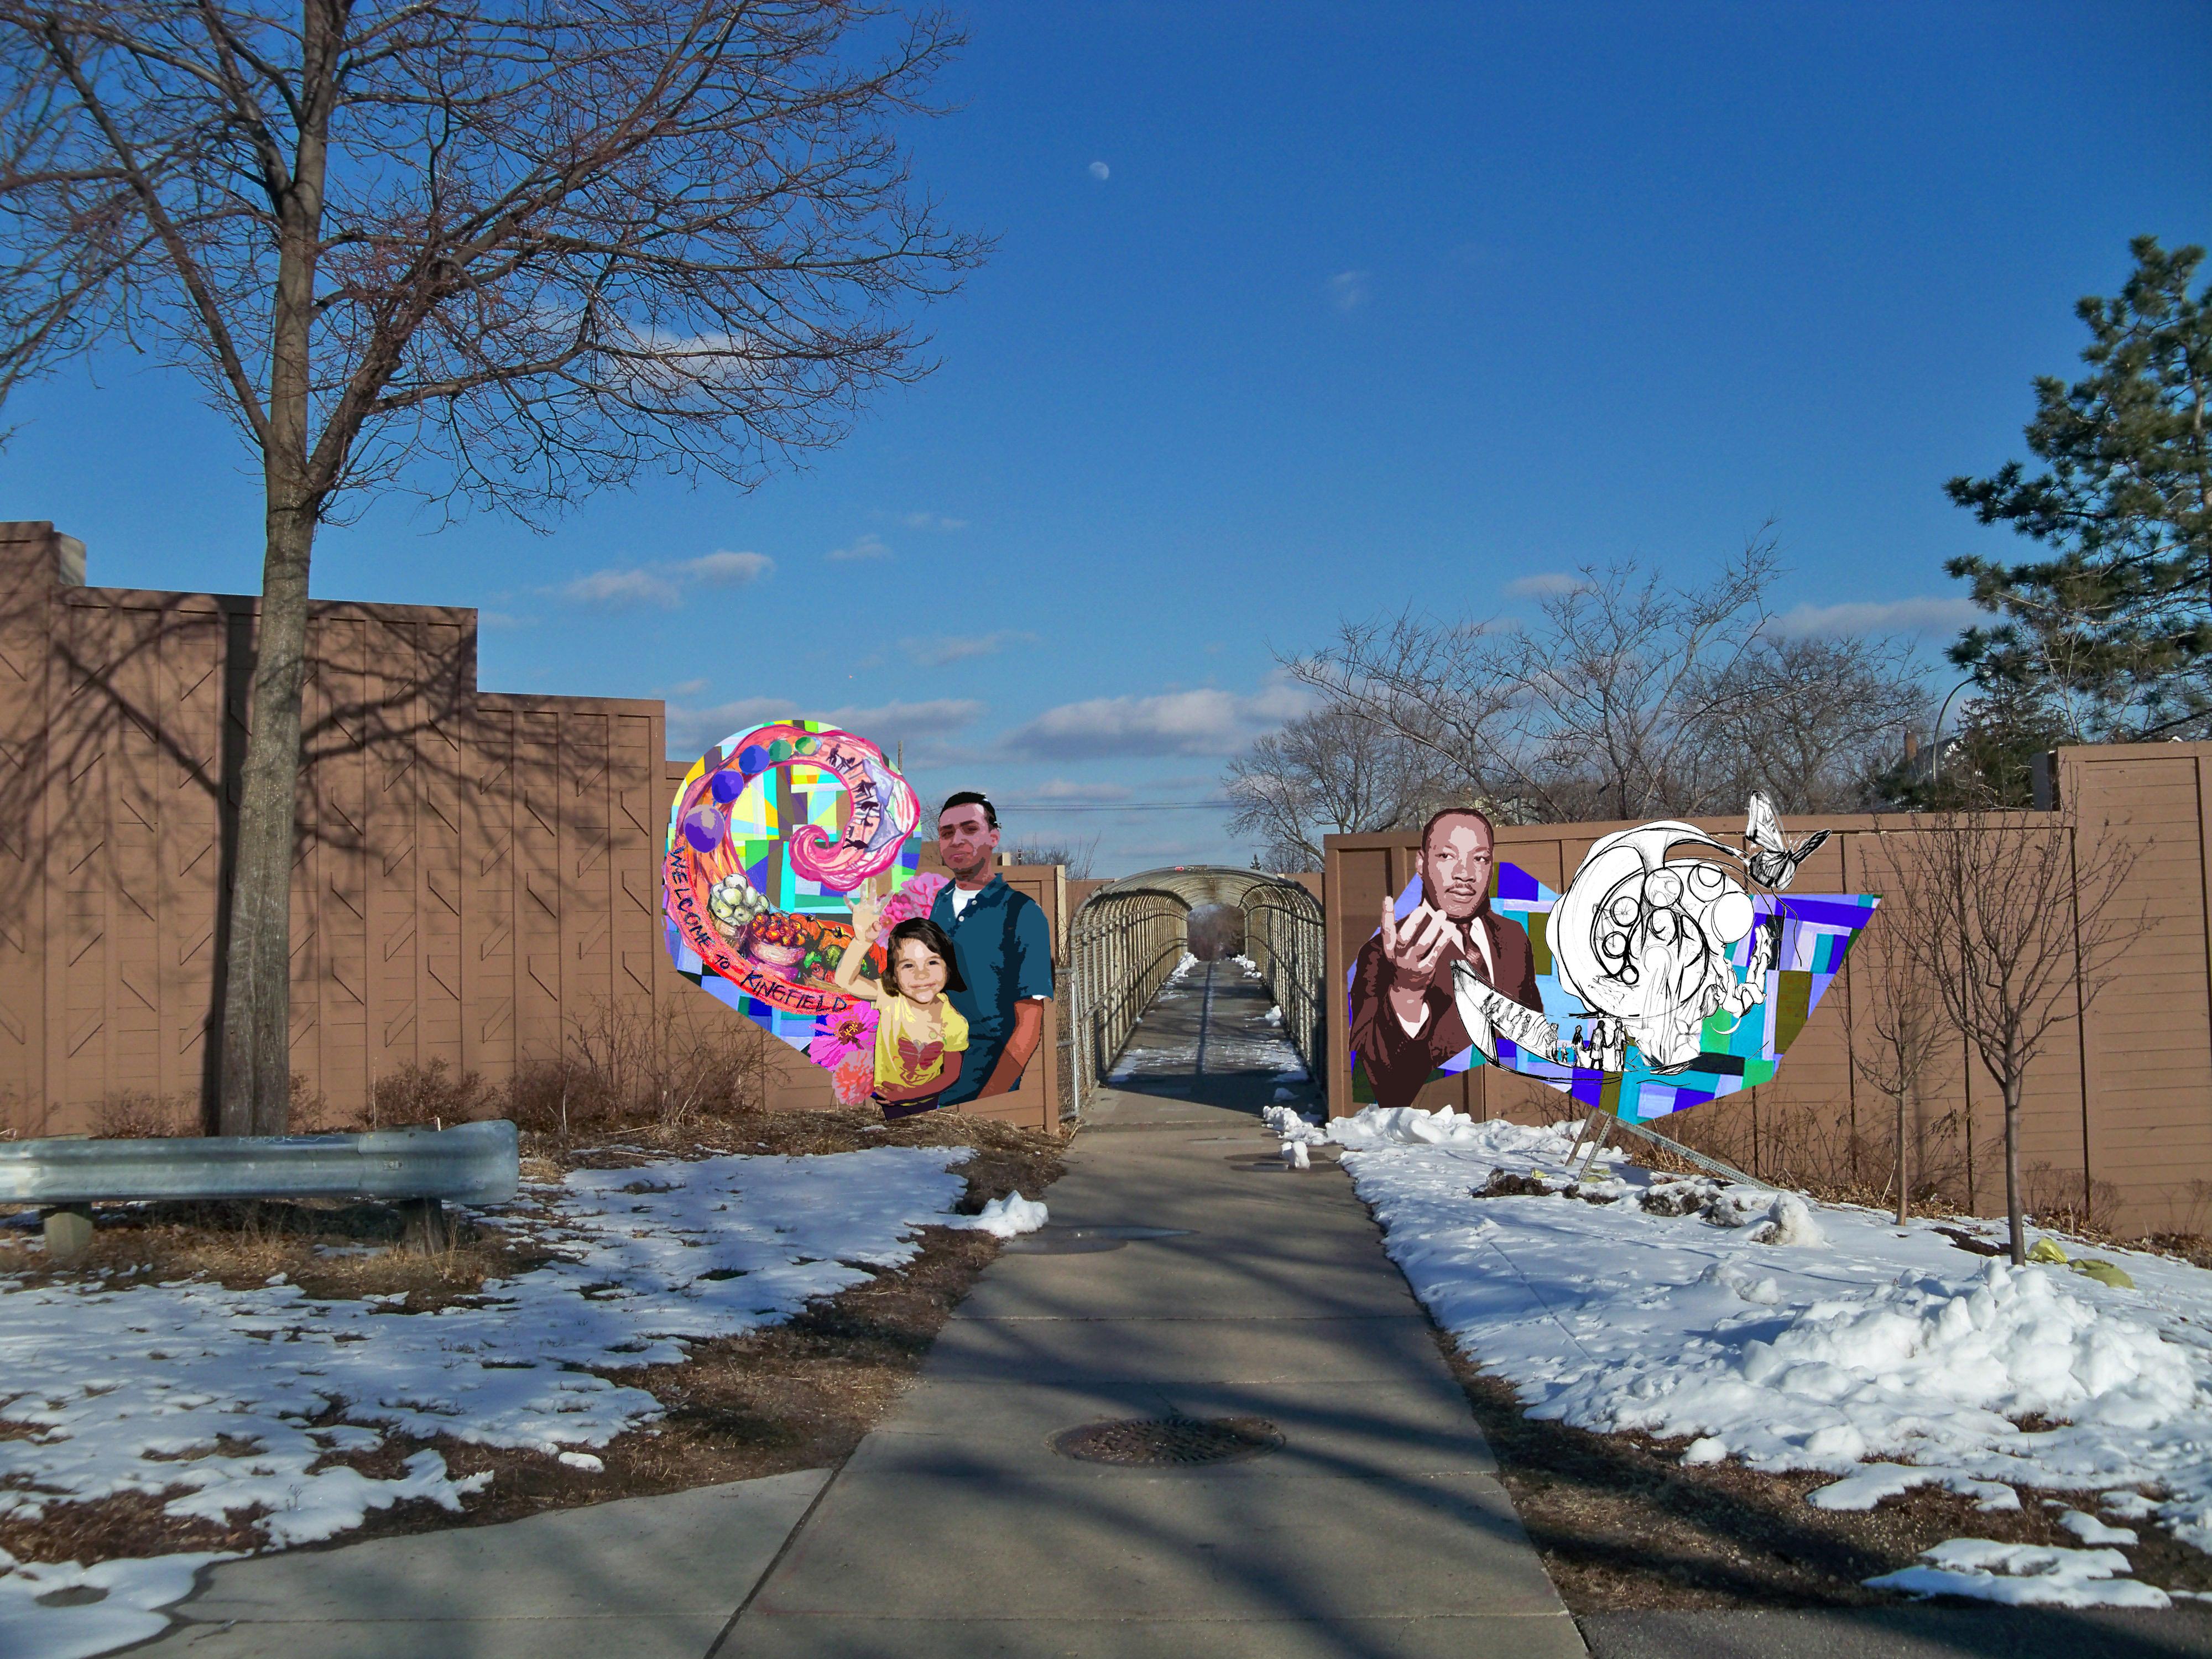 40th Street Gateway Mural